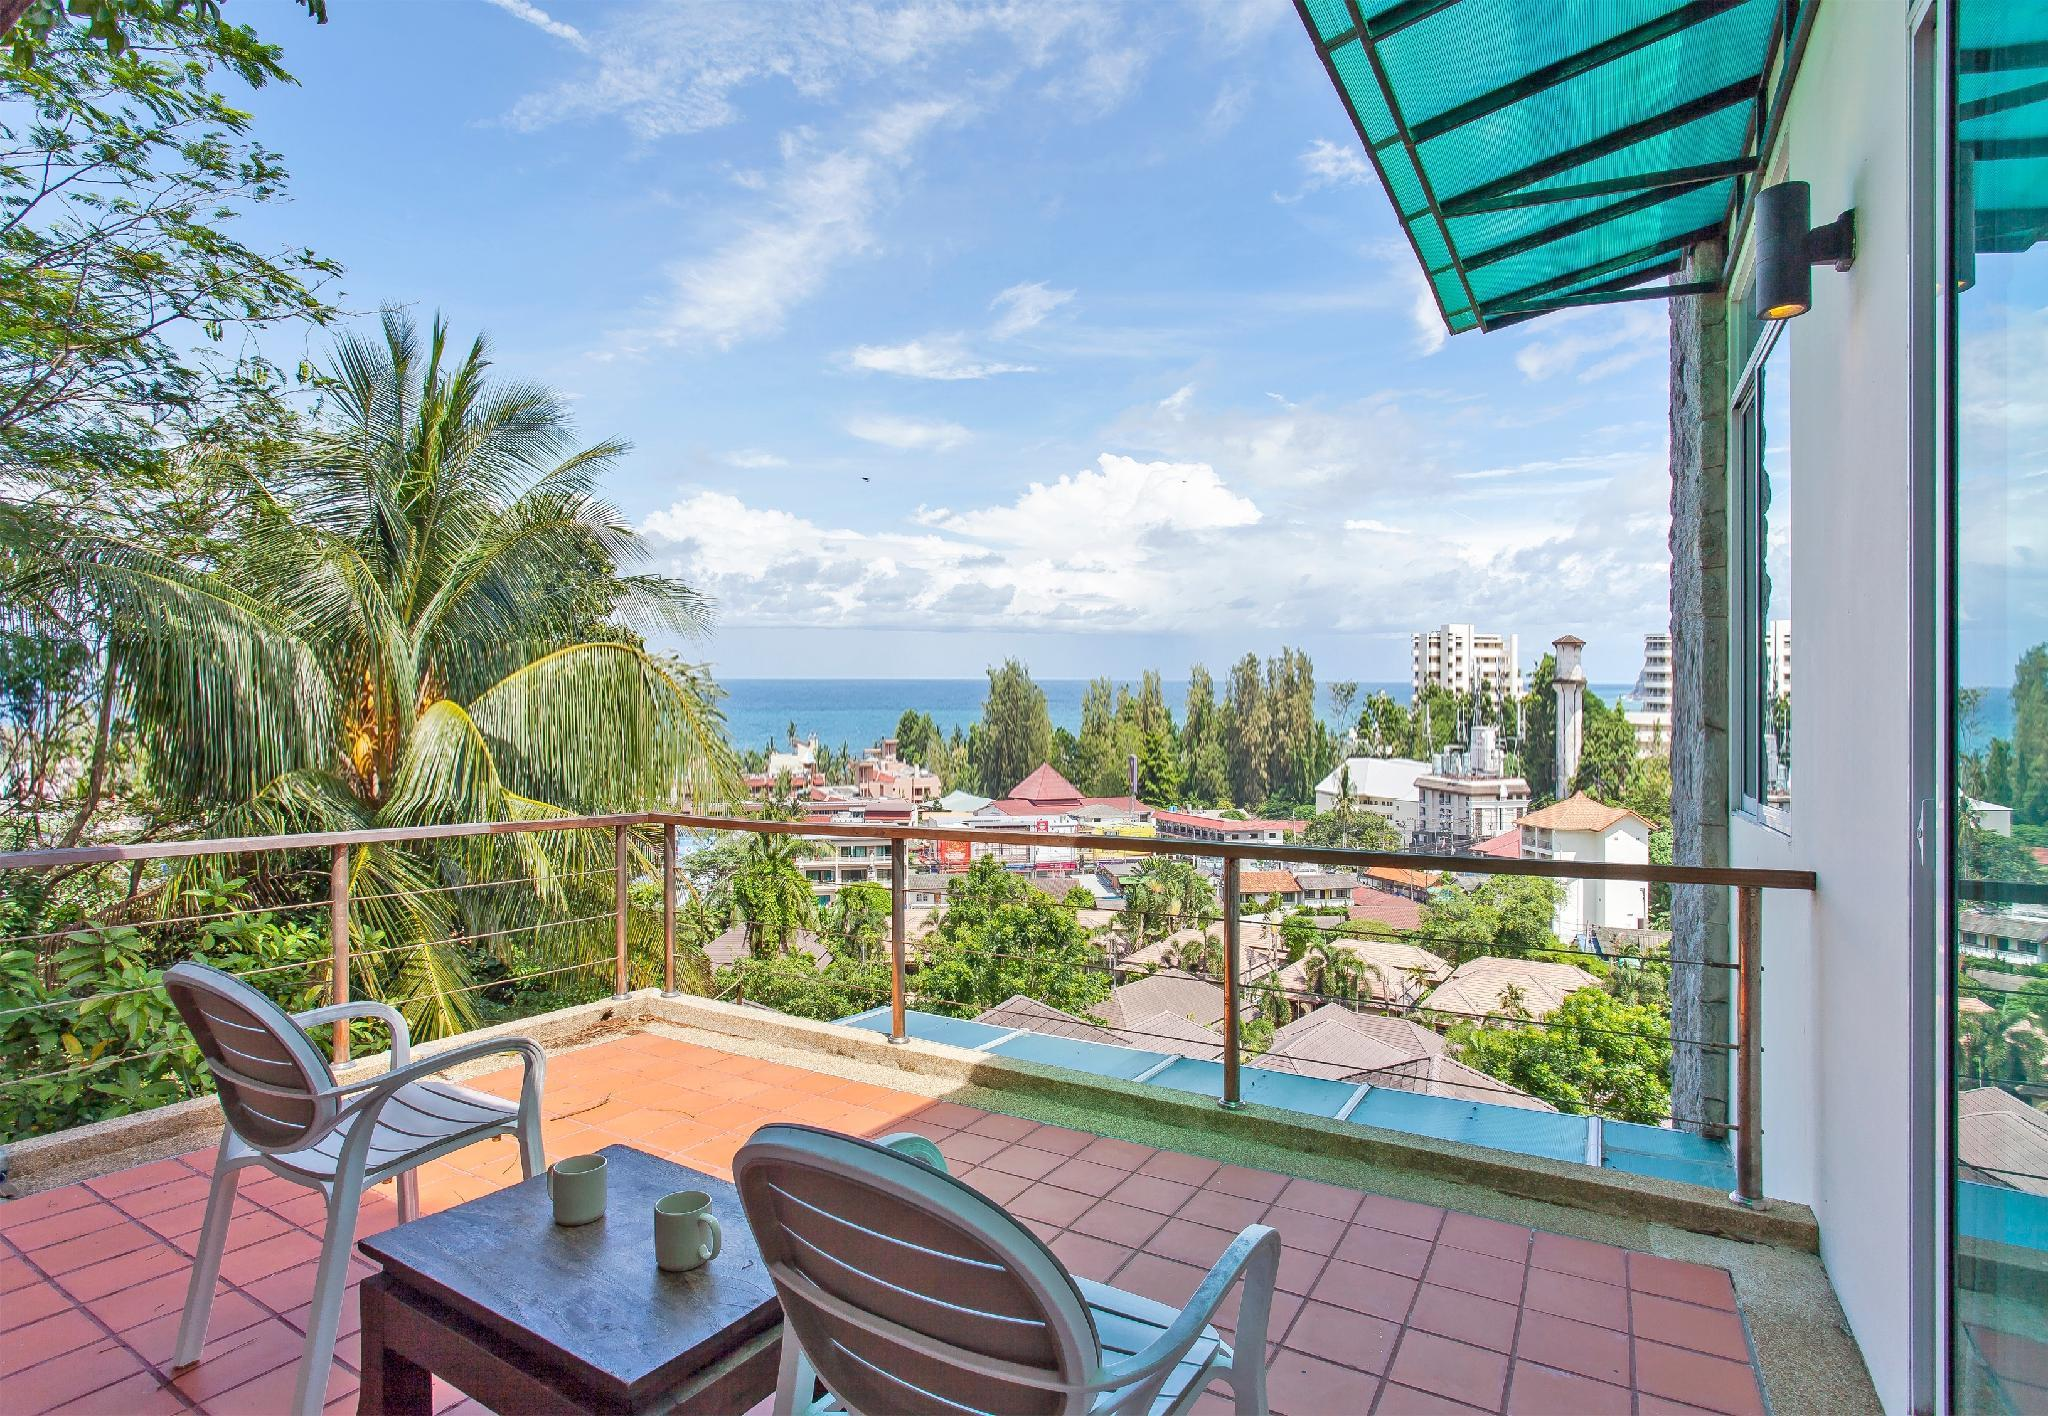 karon 3 bedrooms  seaview pool villa วิลลา 3 ห้องนอน 3 ห้องน้ำส่วนตัว ขนาด 420 ตร.ม. – กะรน